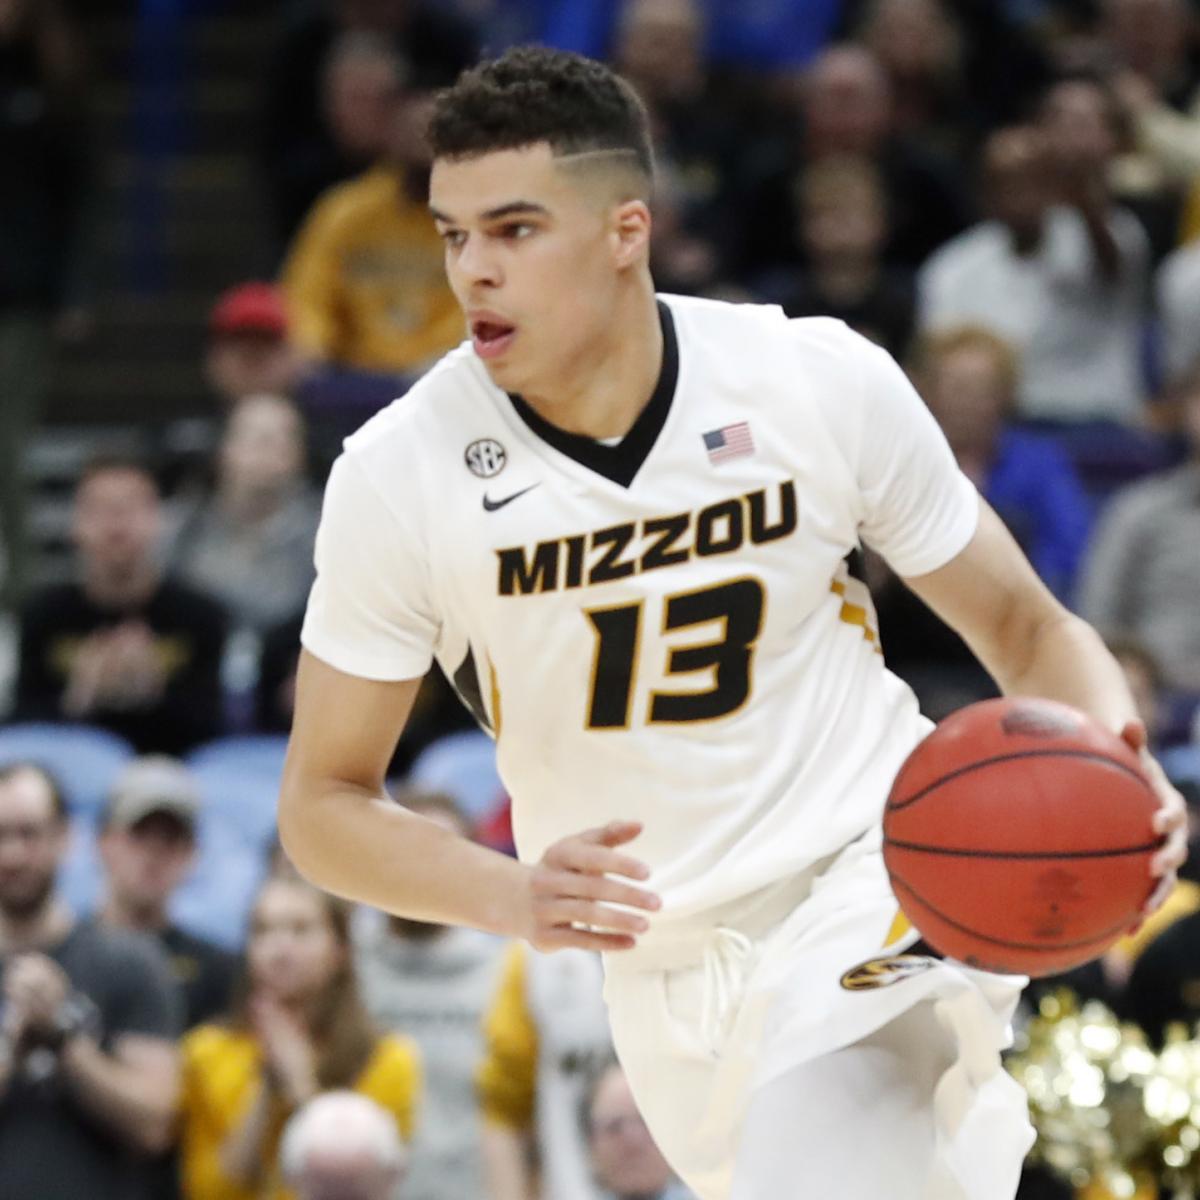 NBA Draft 2018: Latest Mock Draft Ahead of NCAA Tournament